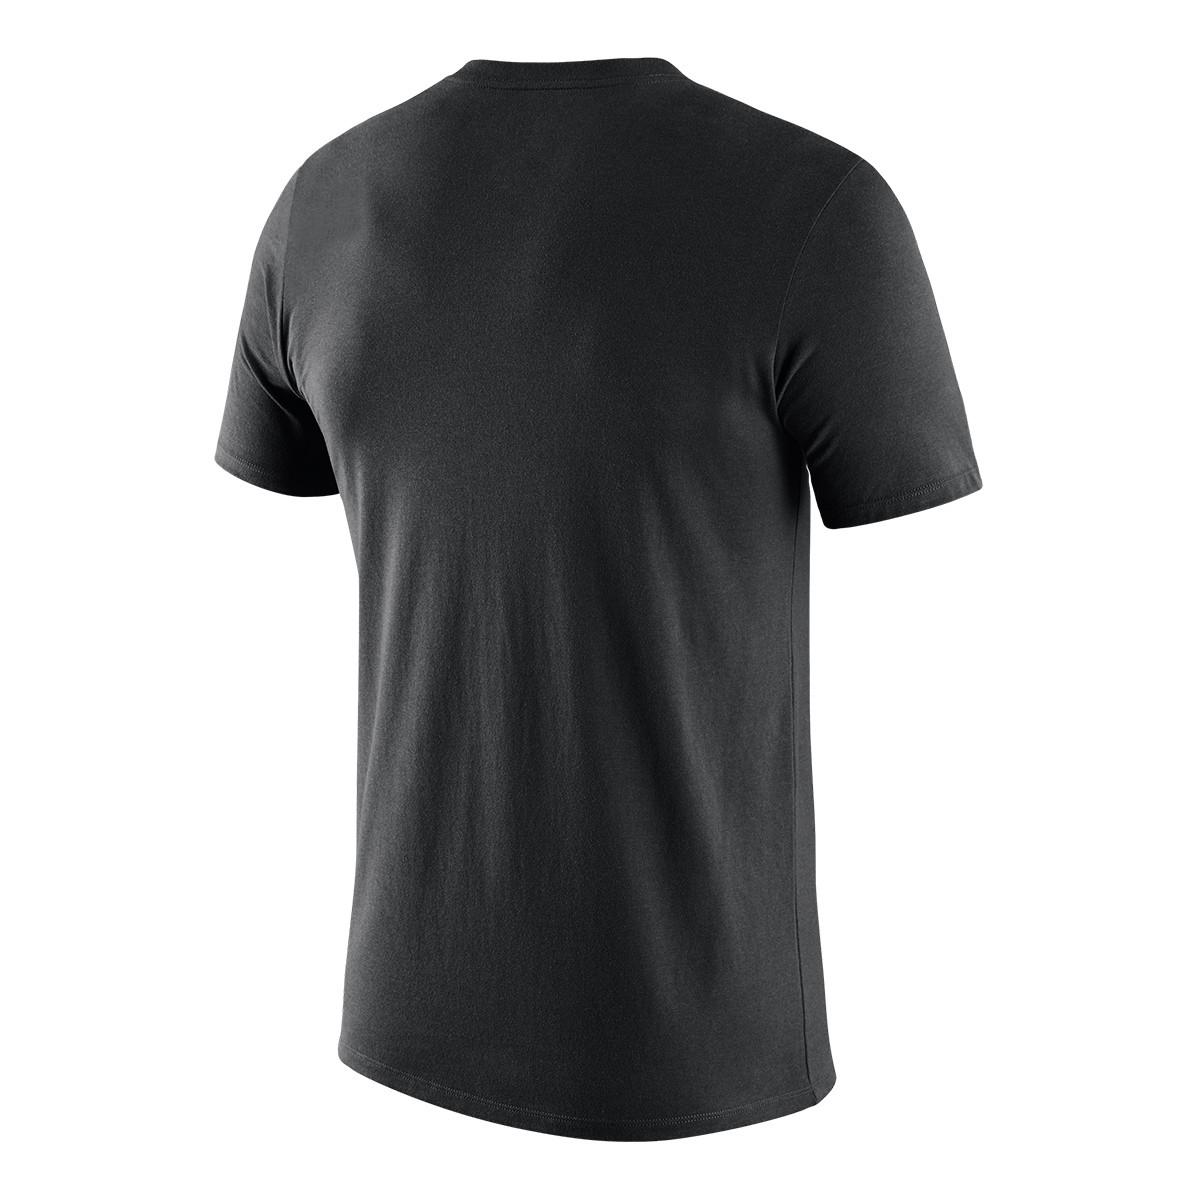 Nike Tee Biggie EX 'Black'-CU1643-010